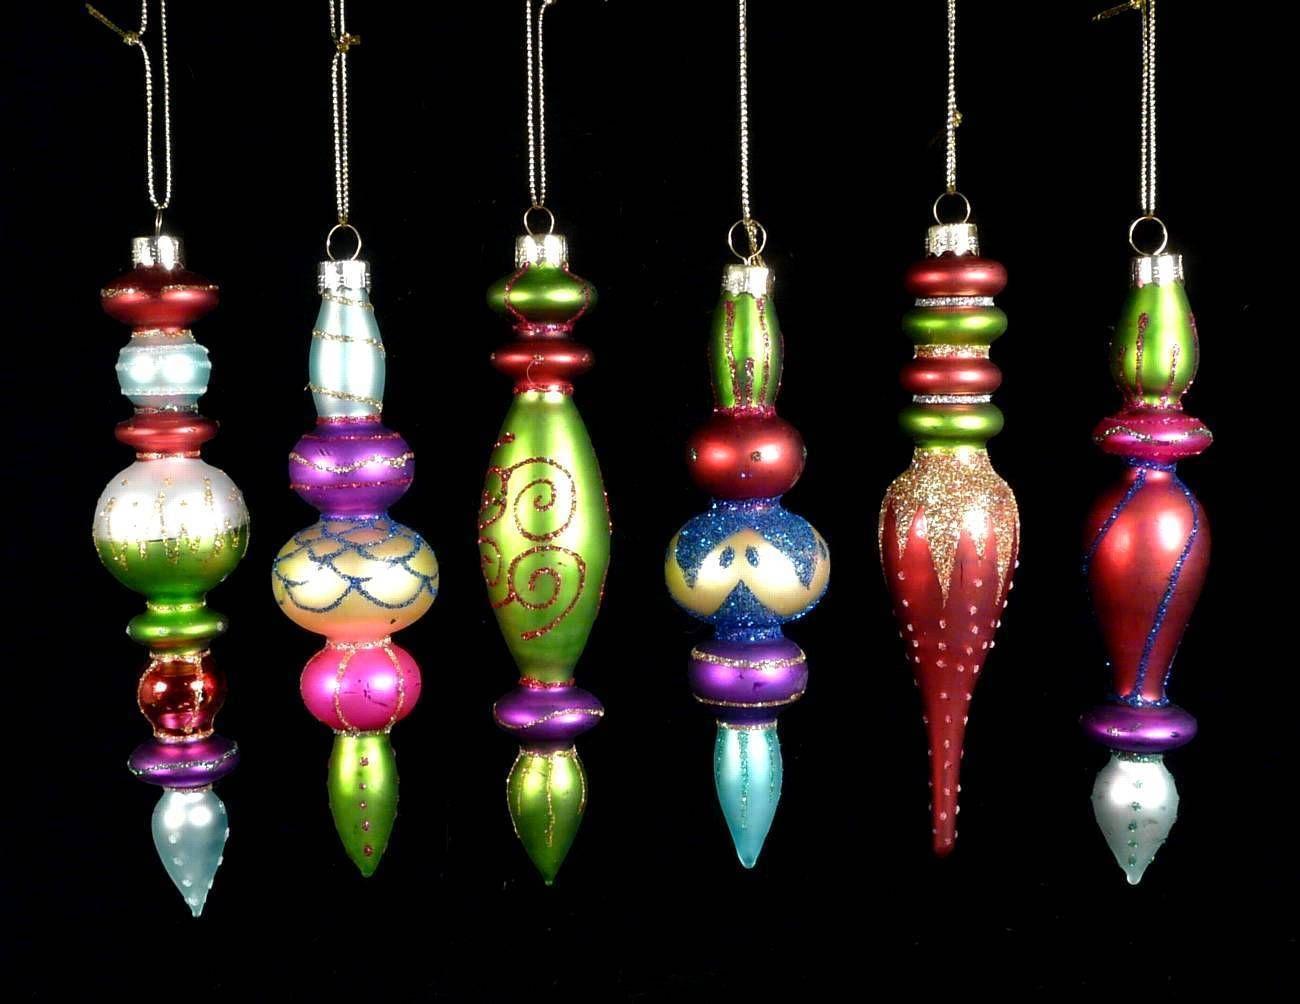 6 Christbaumschmuck Kugeln Zapfen Ornament Baumschmuck Glas Bunt